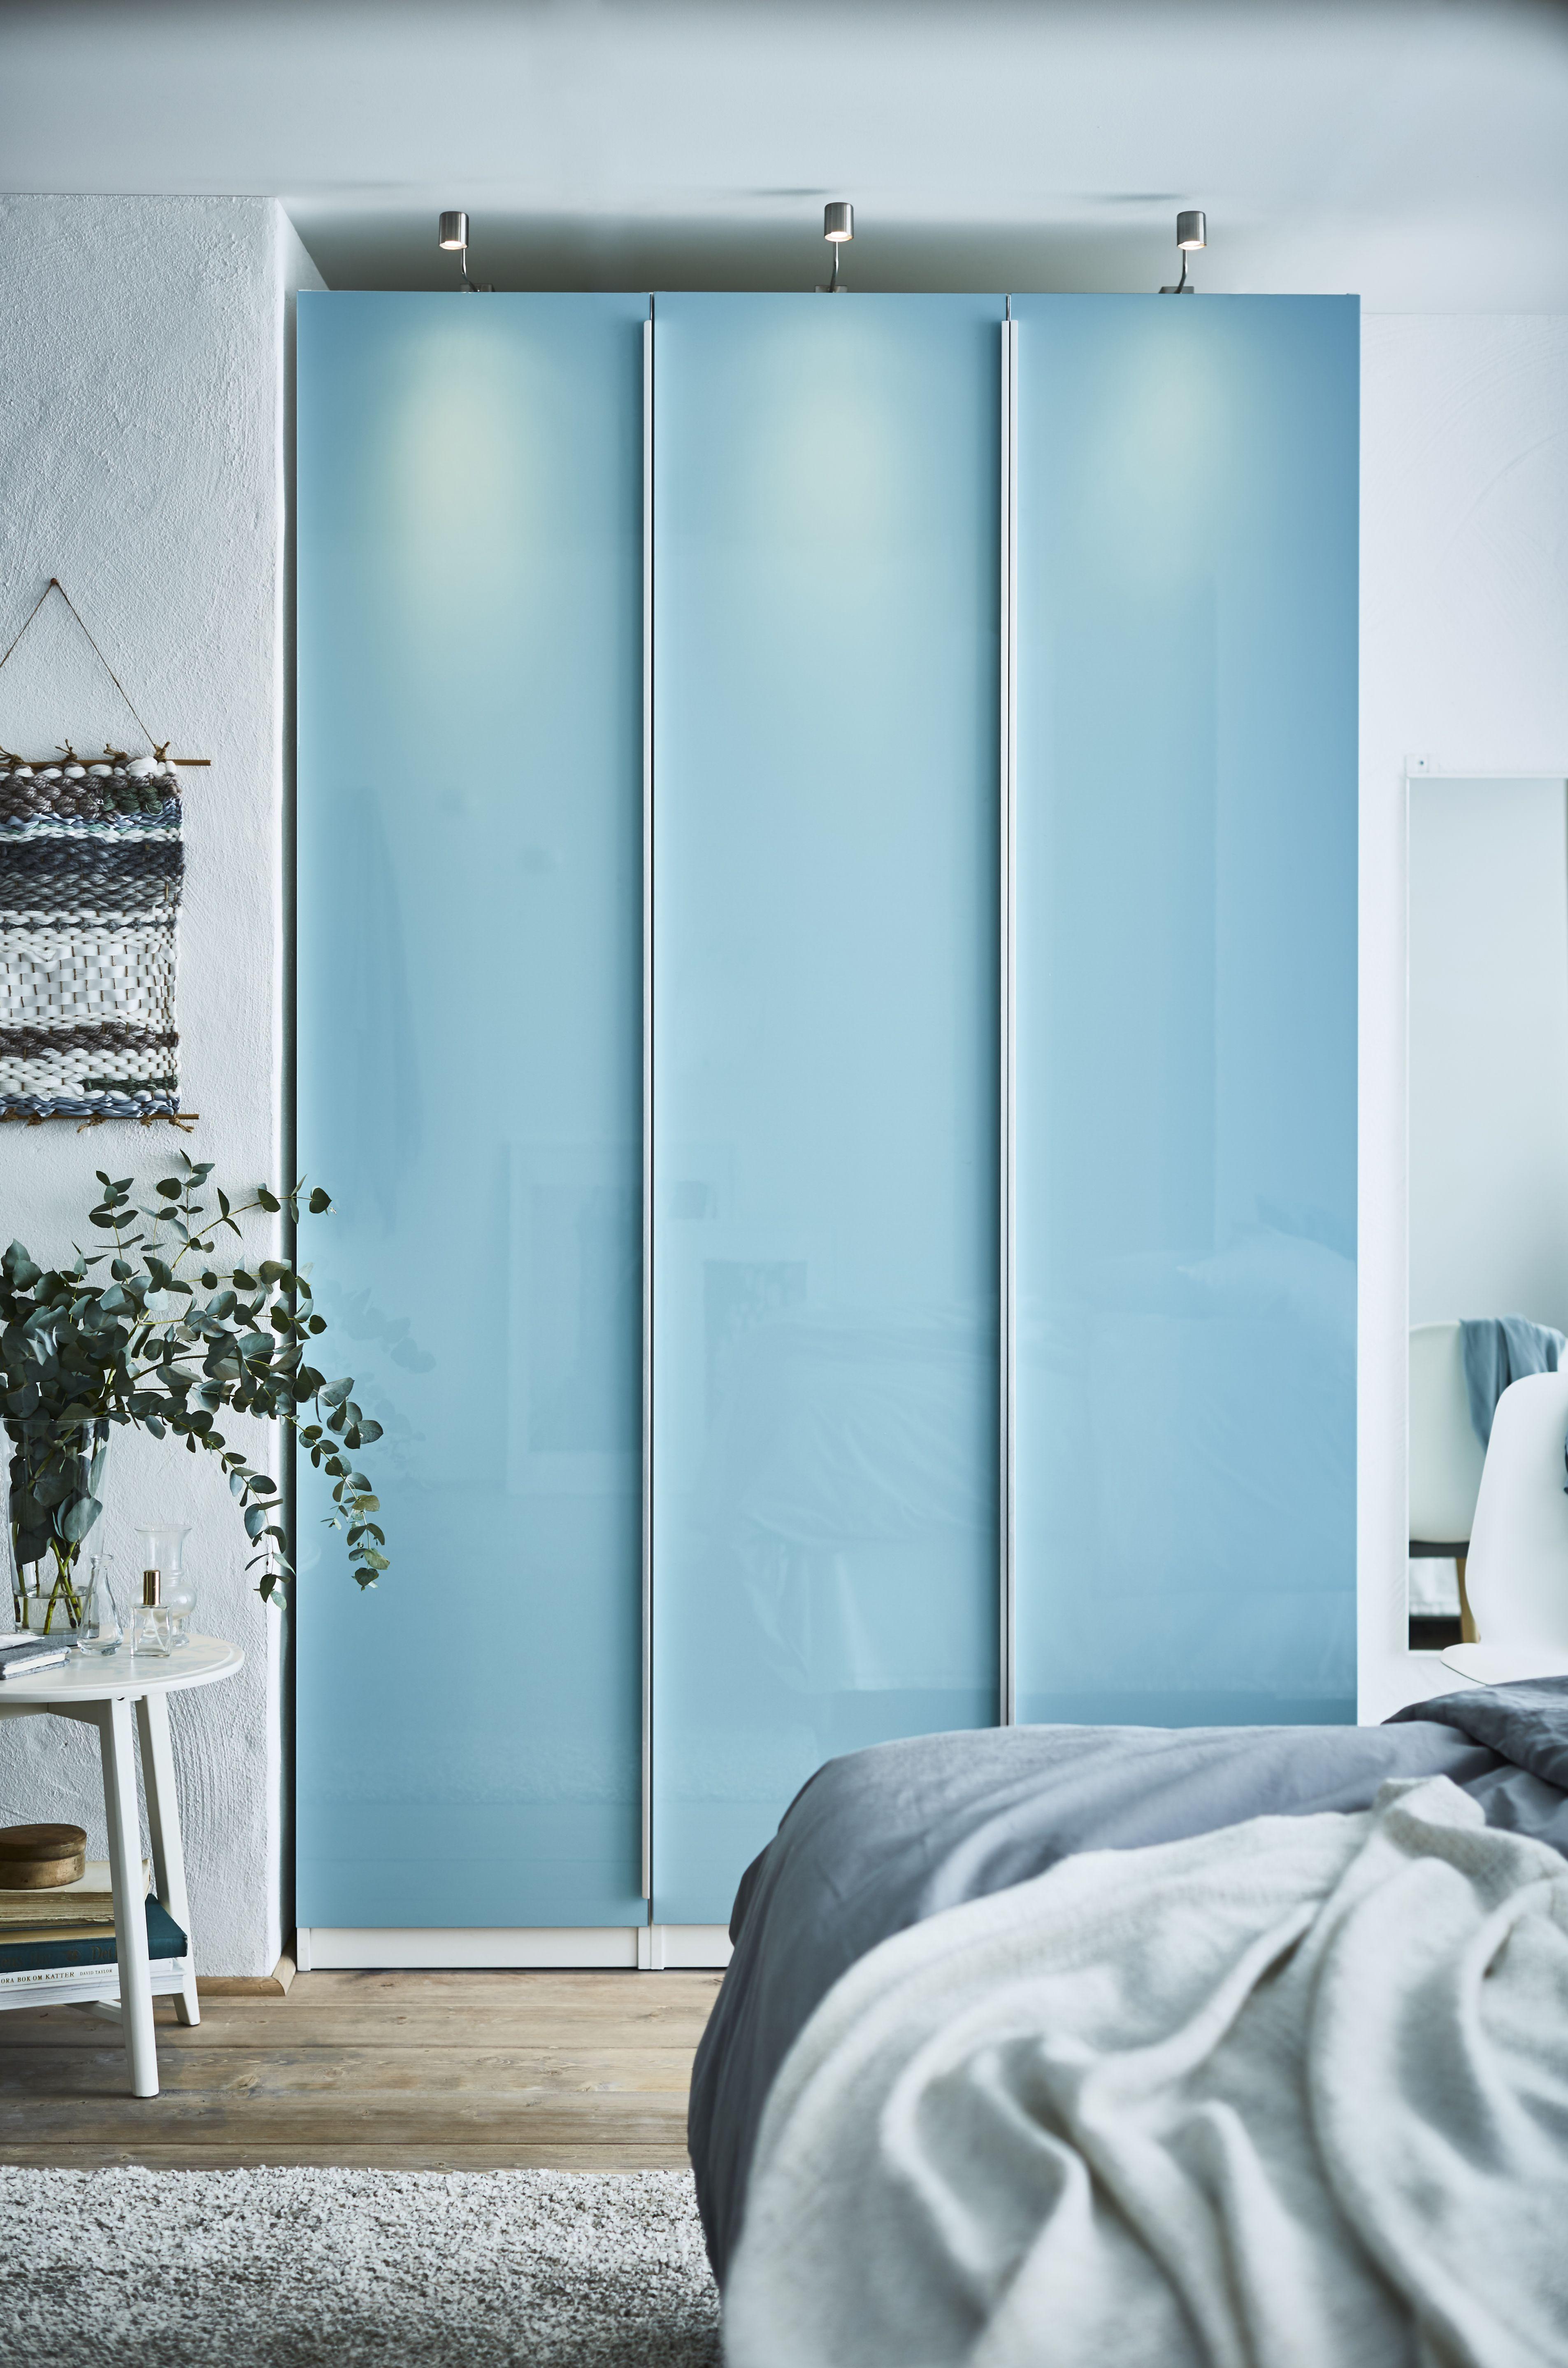 Ikea pax türen hochglanz  FARDAL Tür, Hochglanz helltürkis